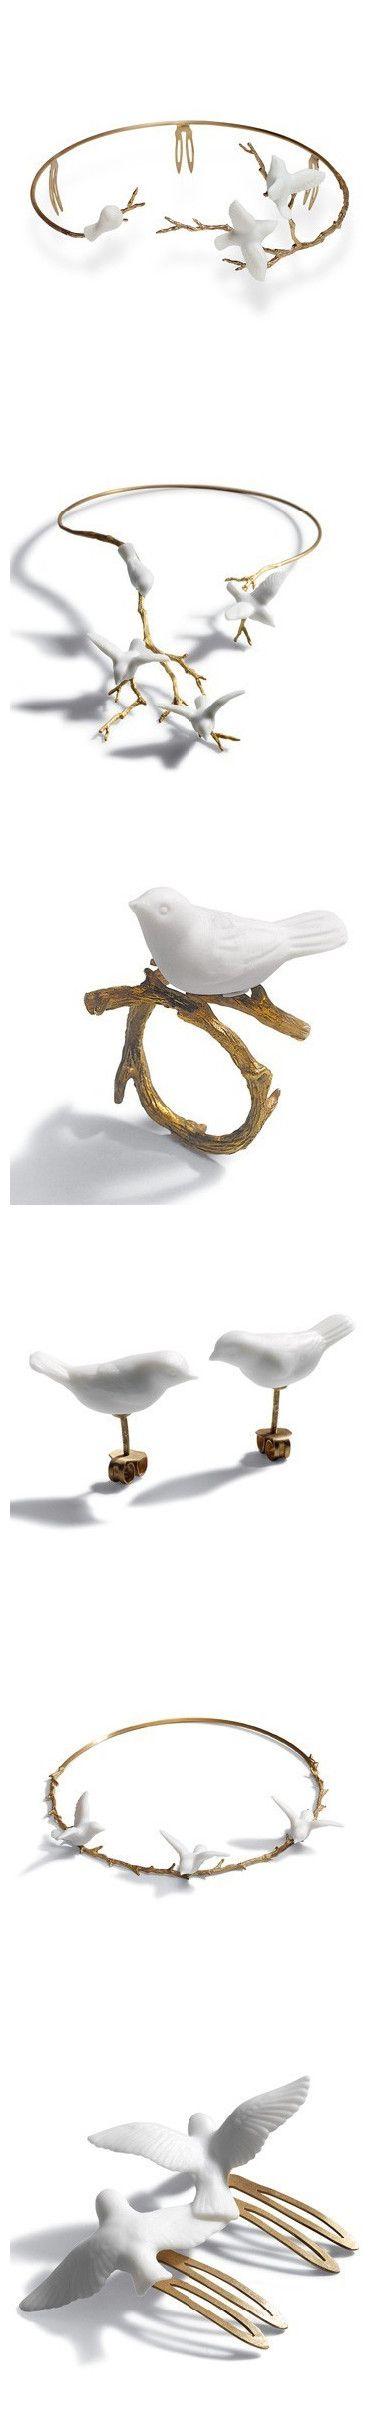 bird jewelry                                                                                                                                                                                 More